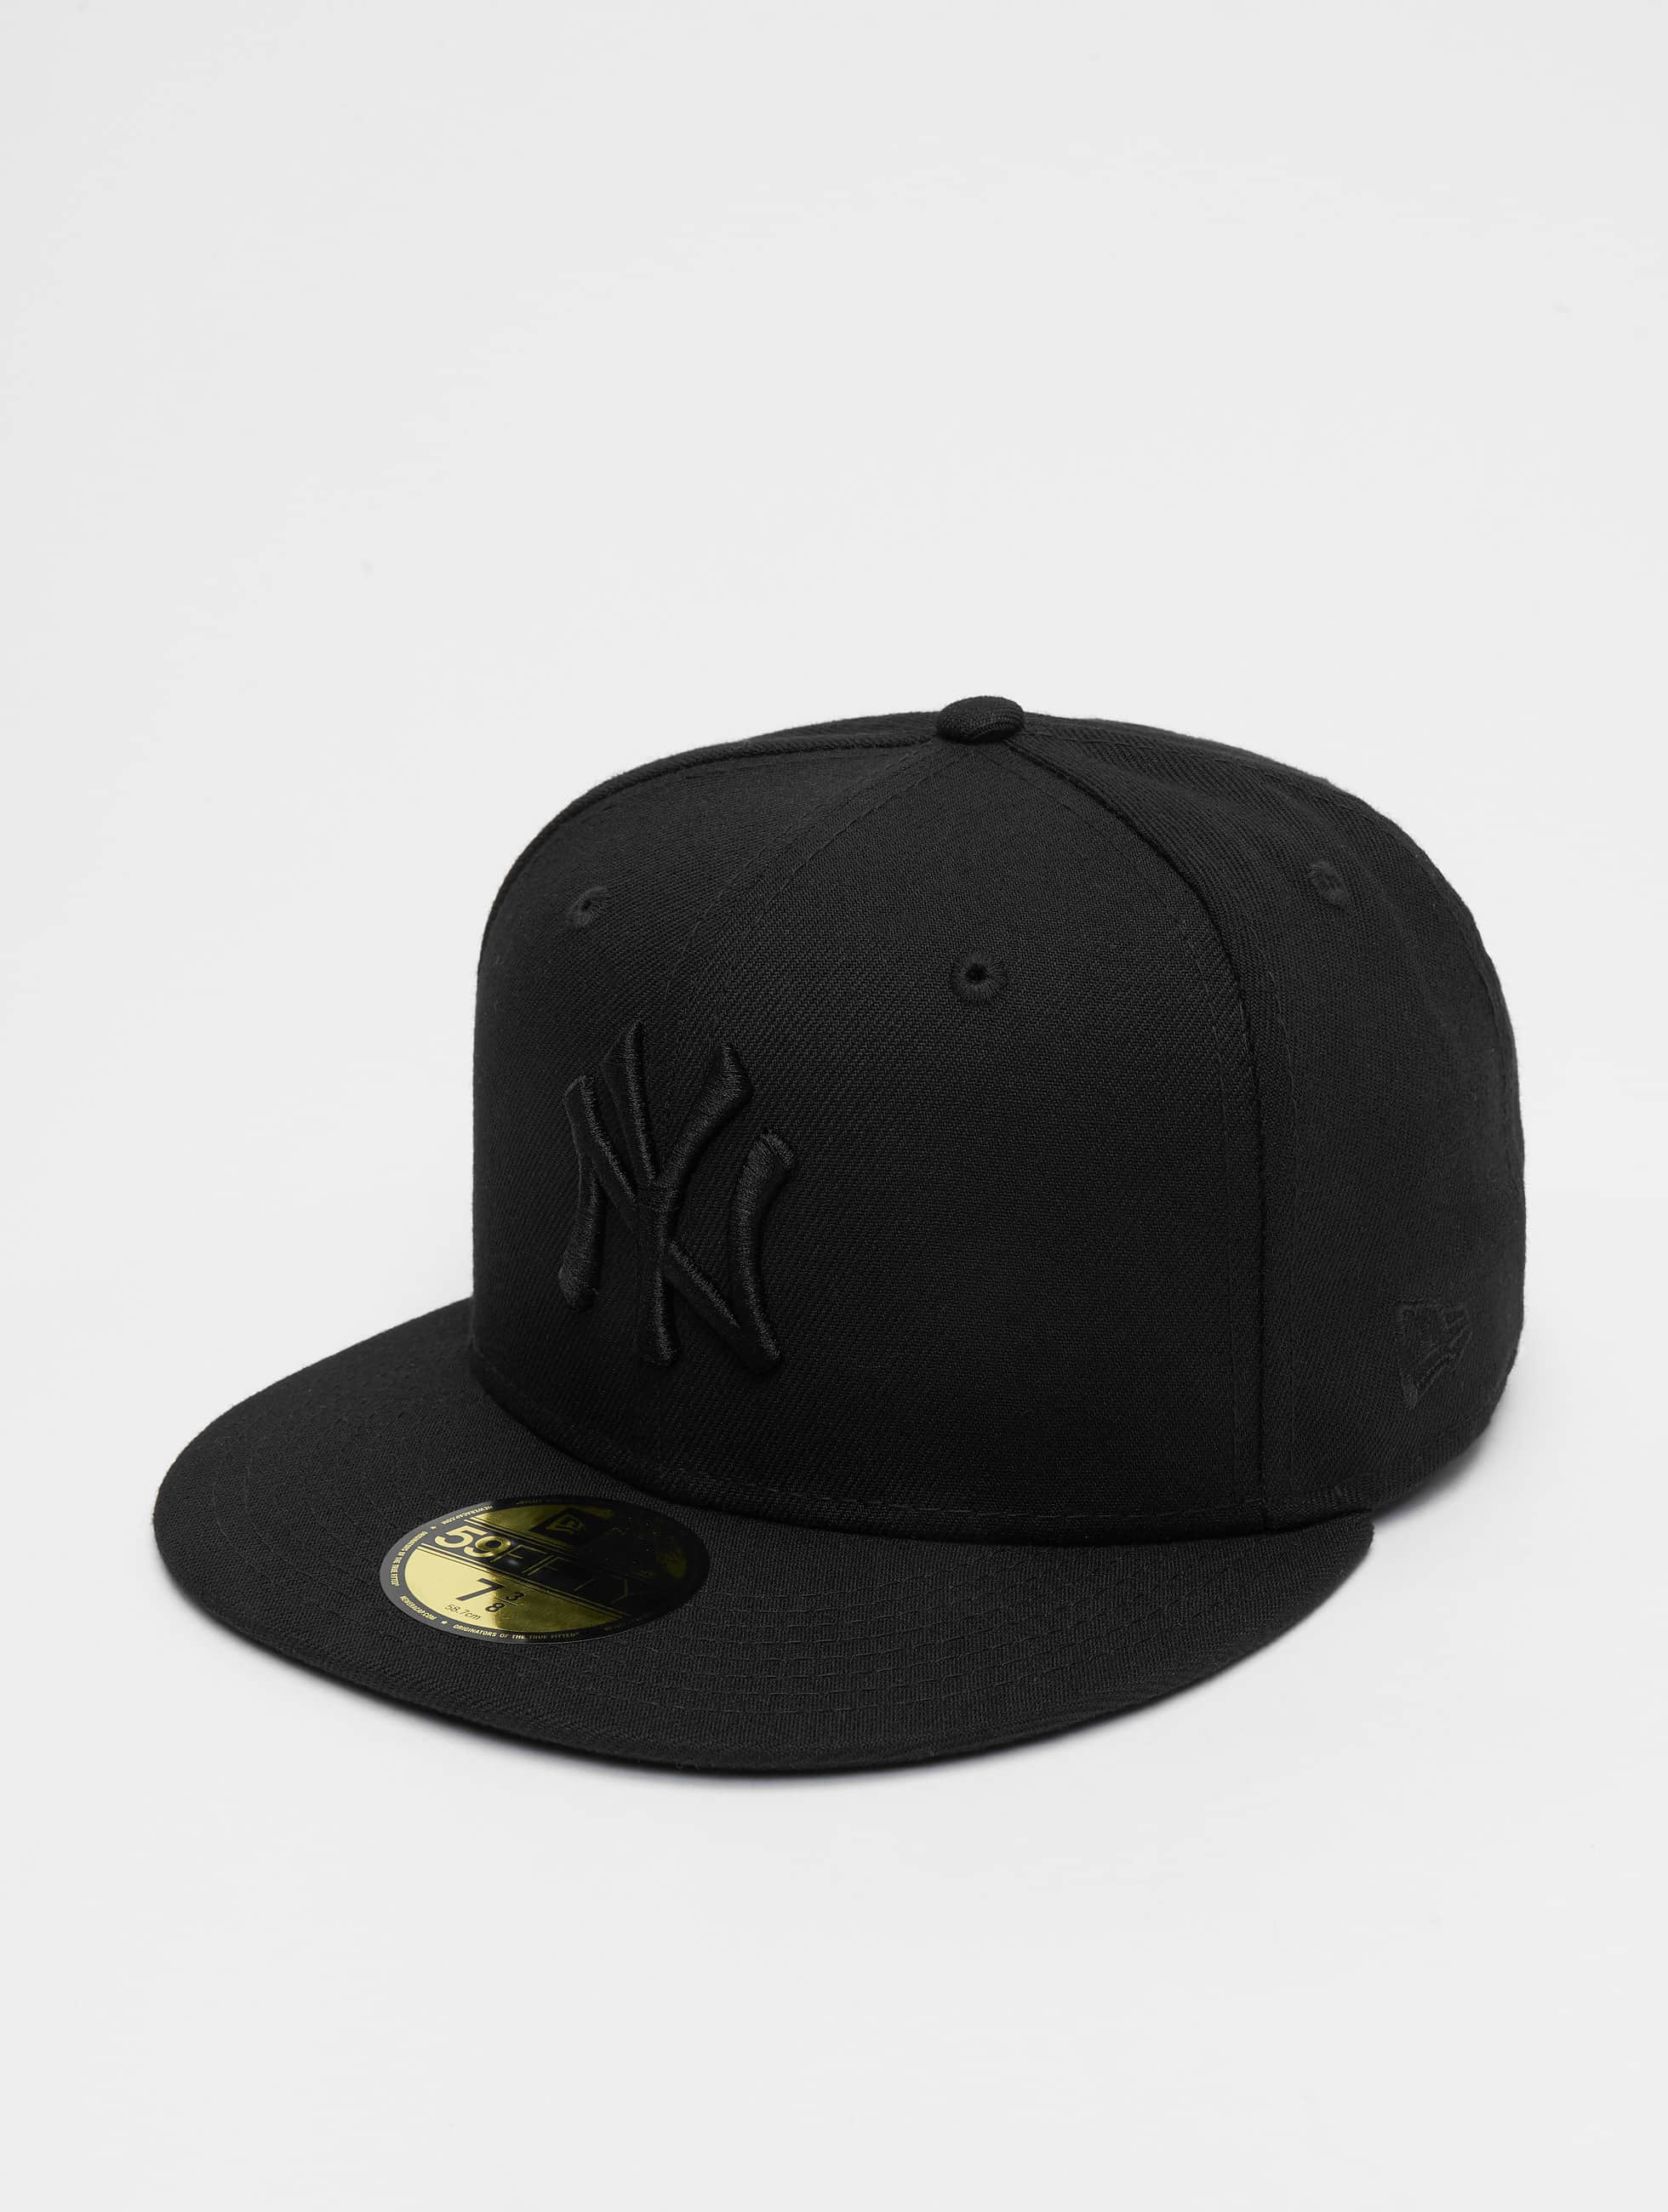 new era gorra gorra plana black on black ny yankees en. Black Bedroom Furniture Sets. Home Design Ideas